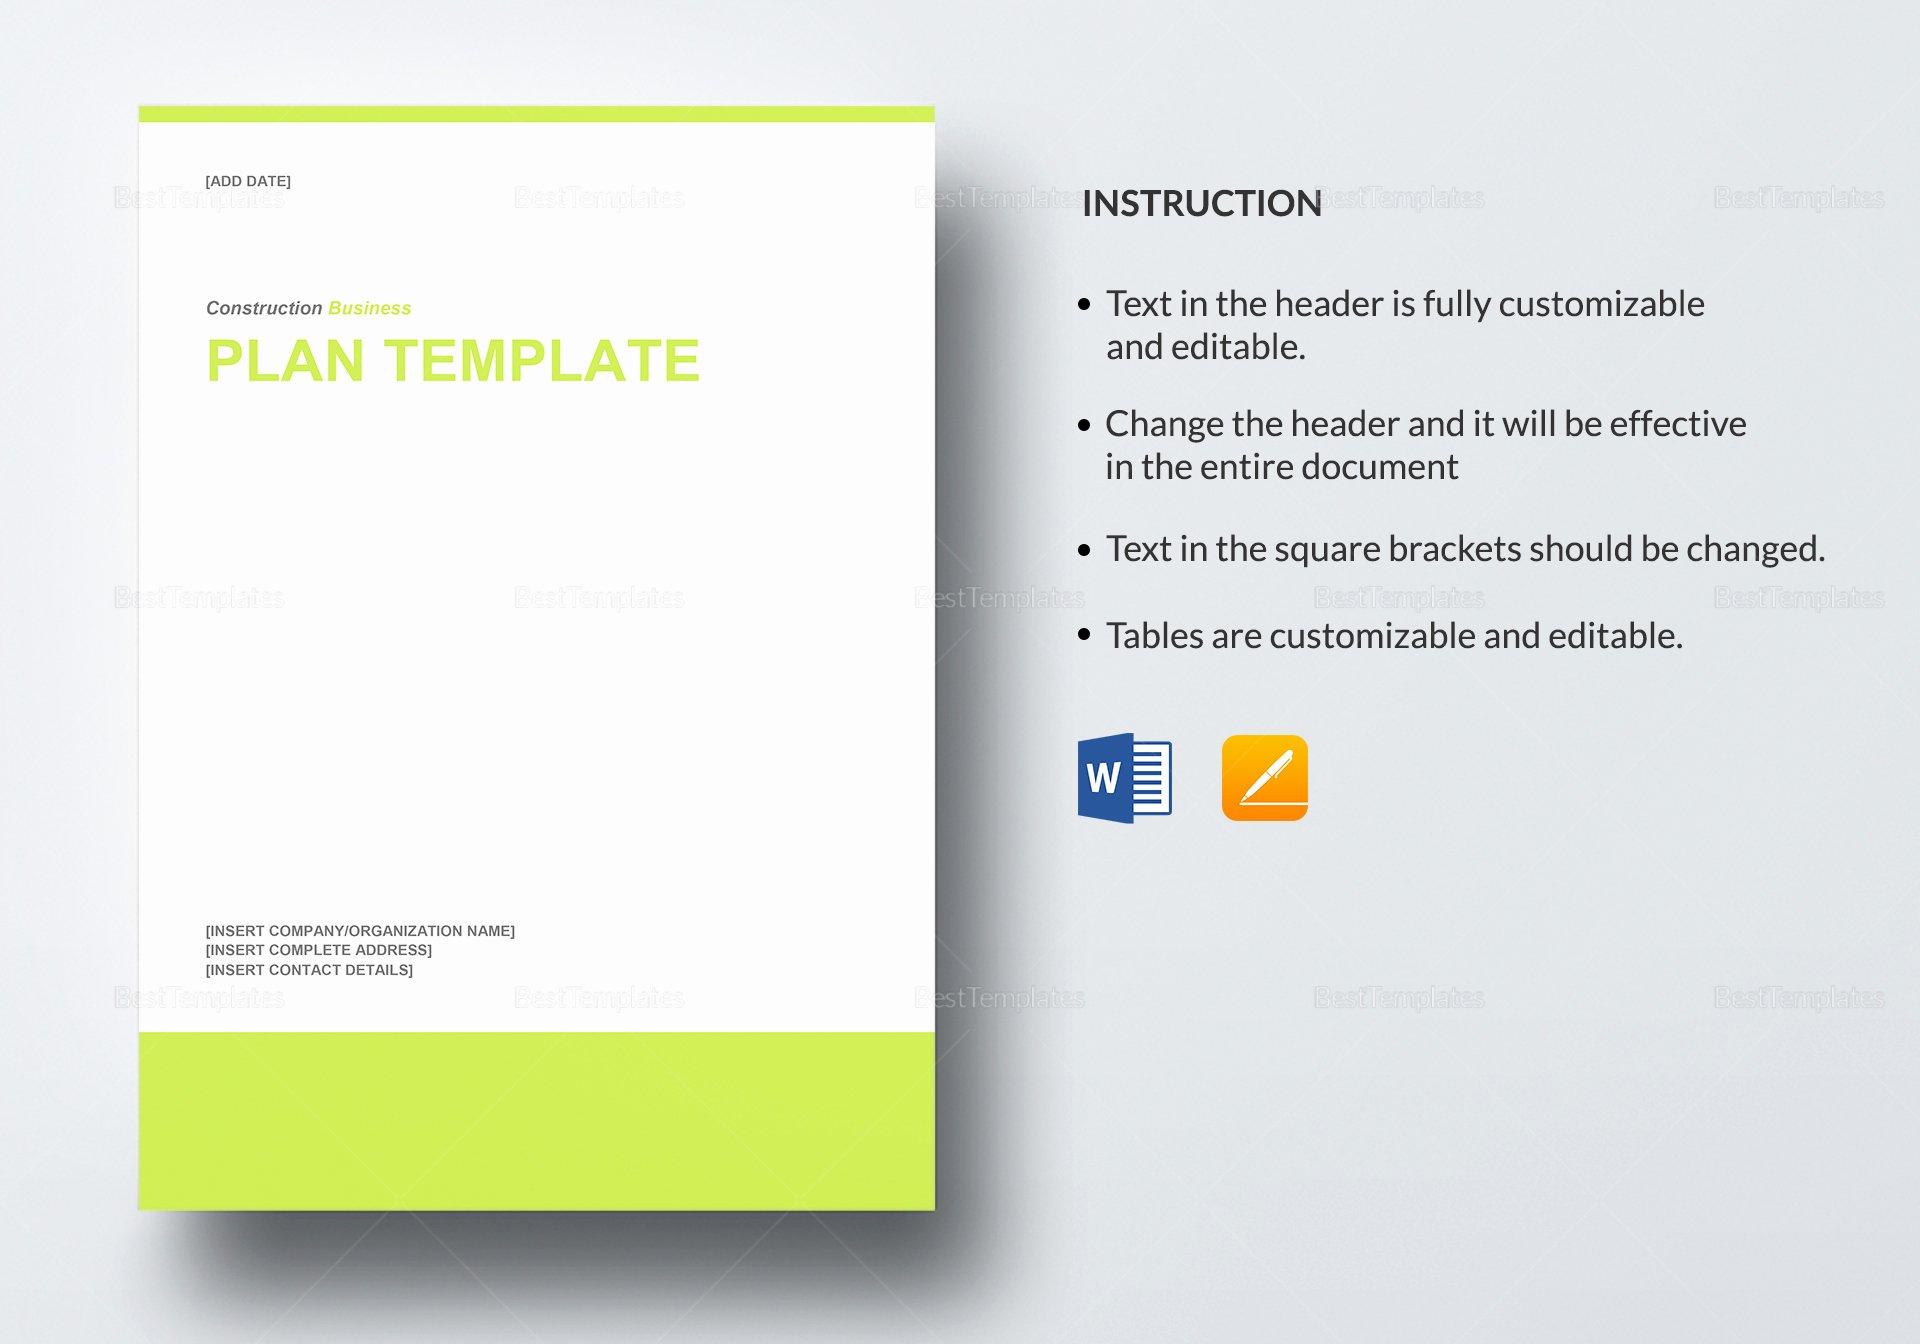 Business Plan Template Google Docs New Construction Business Plan Template In Word Google Docs